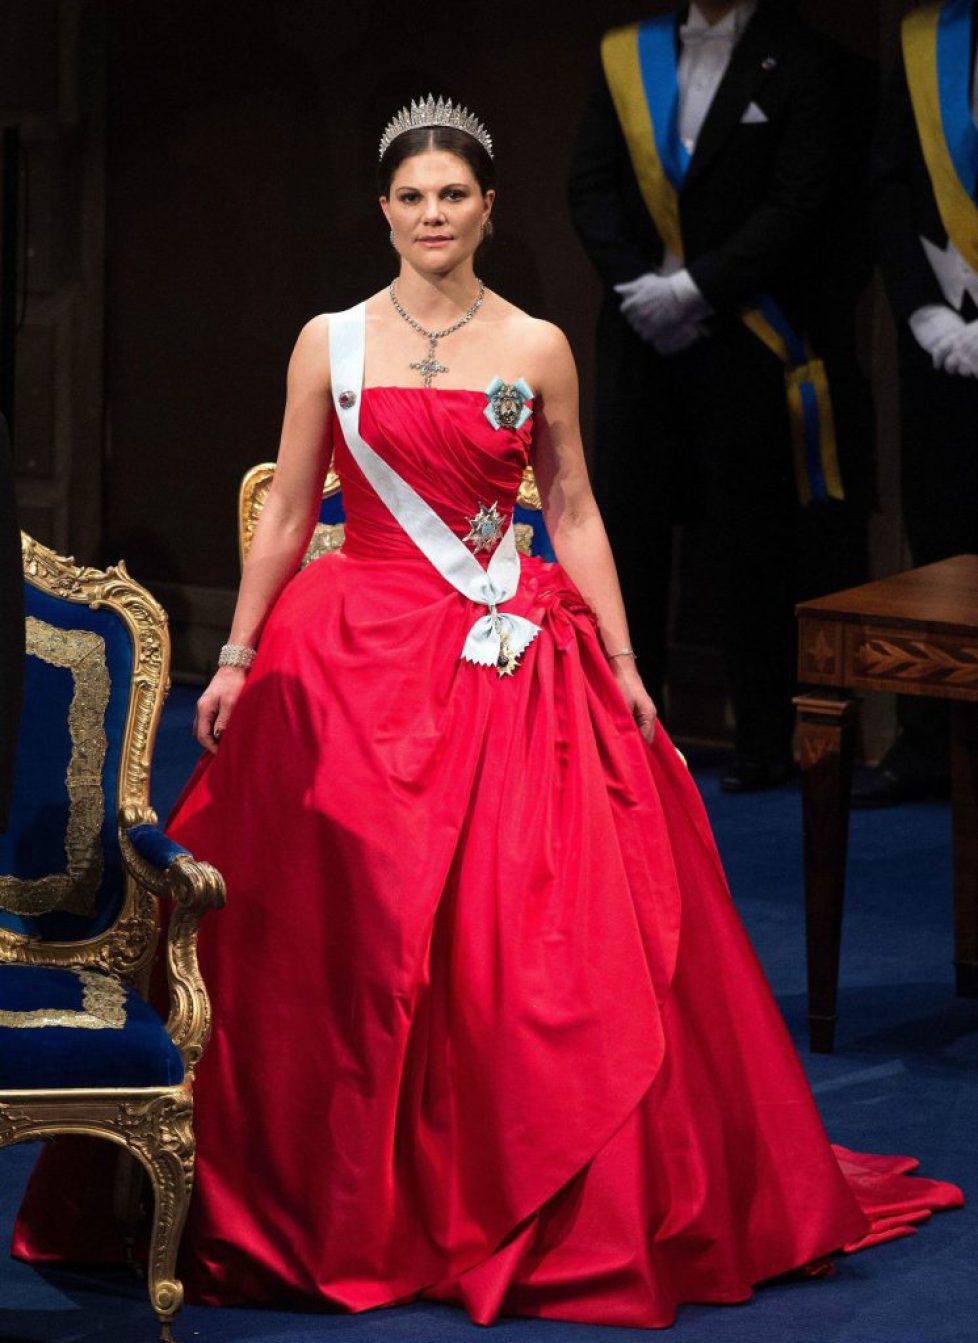 fashion-2014-12-princess-victoria-nobel-peace-prize-stockholm-2014-main